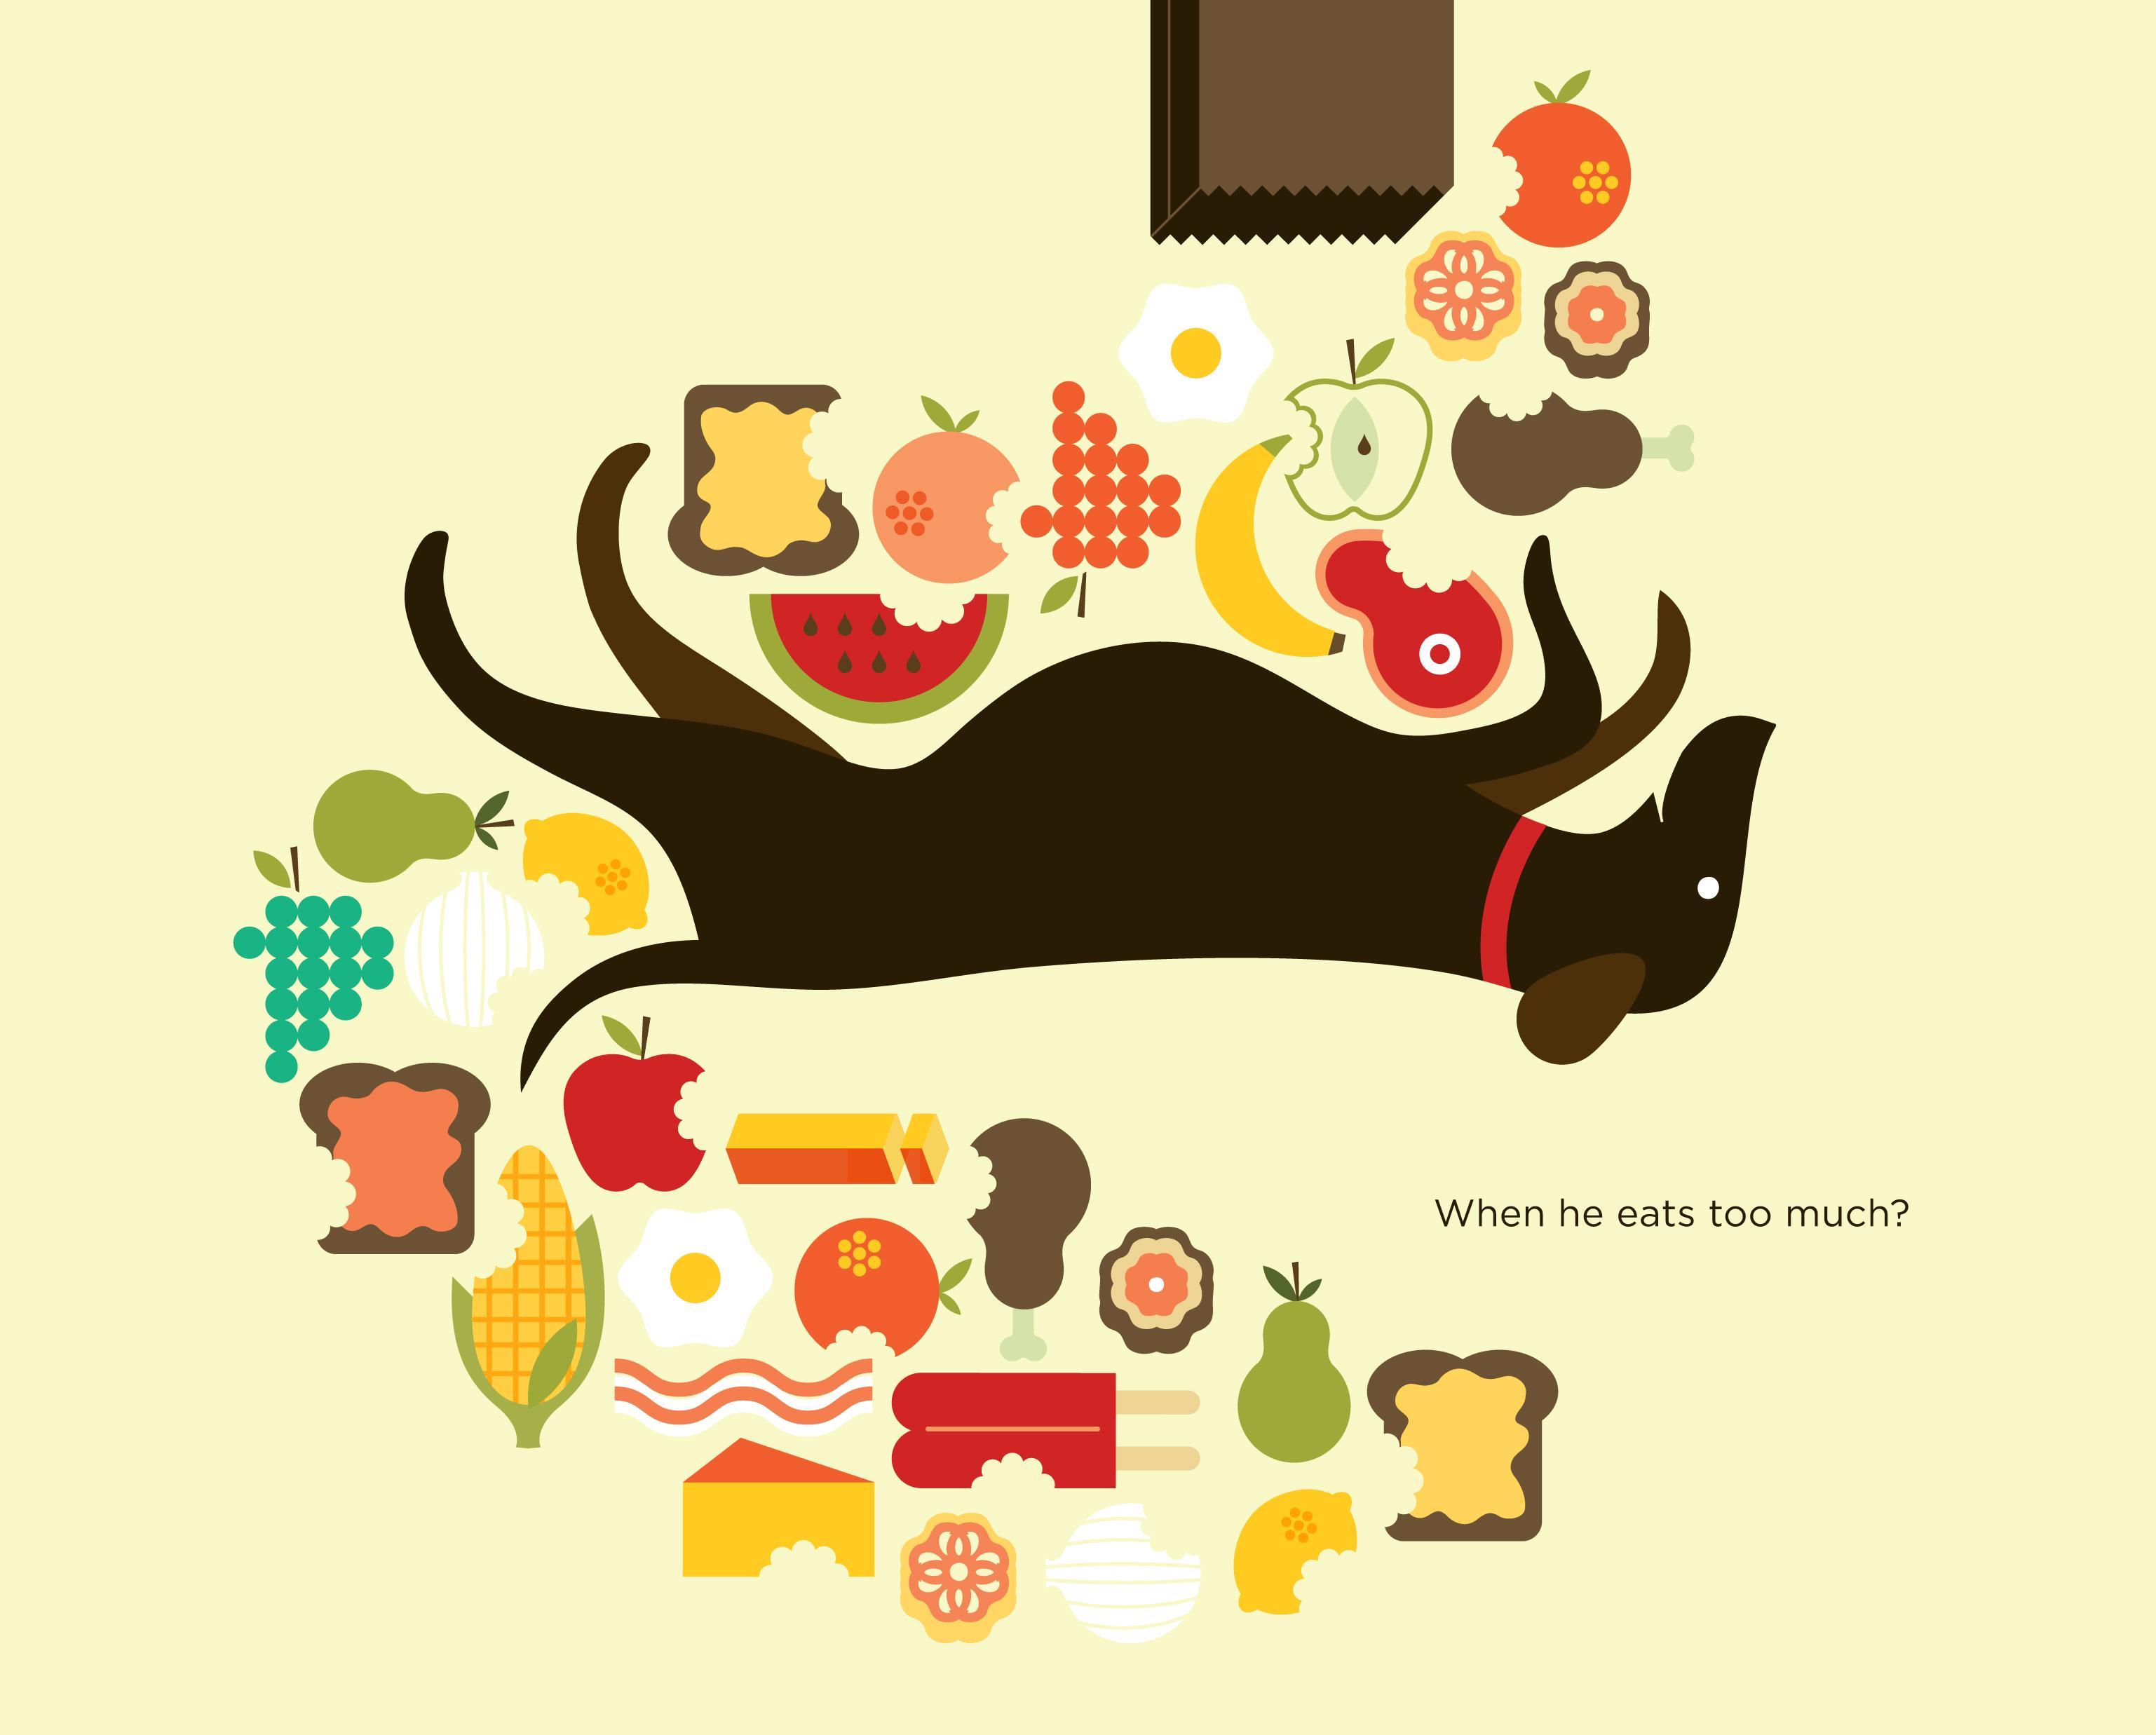 Wallpaper Warna Warni Ilustrasi Makanan Karya Seni Buah